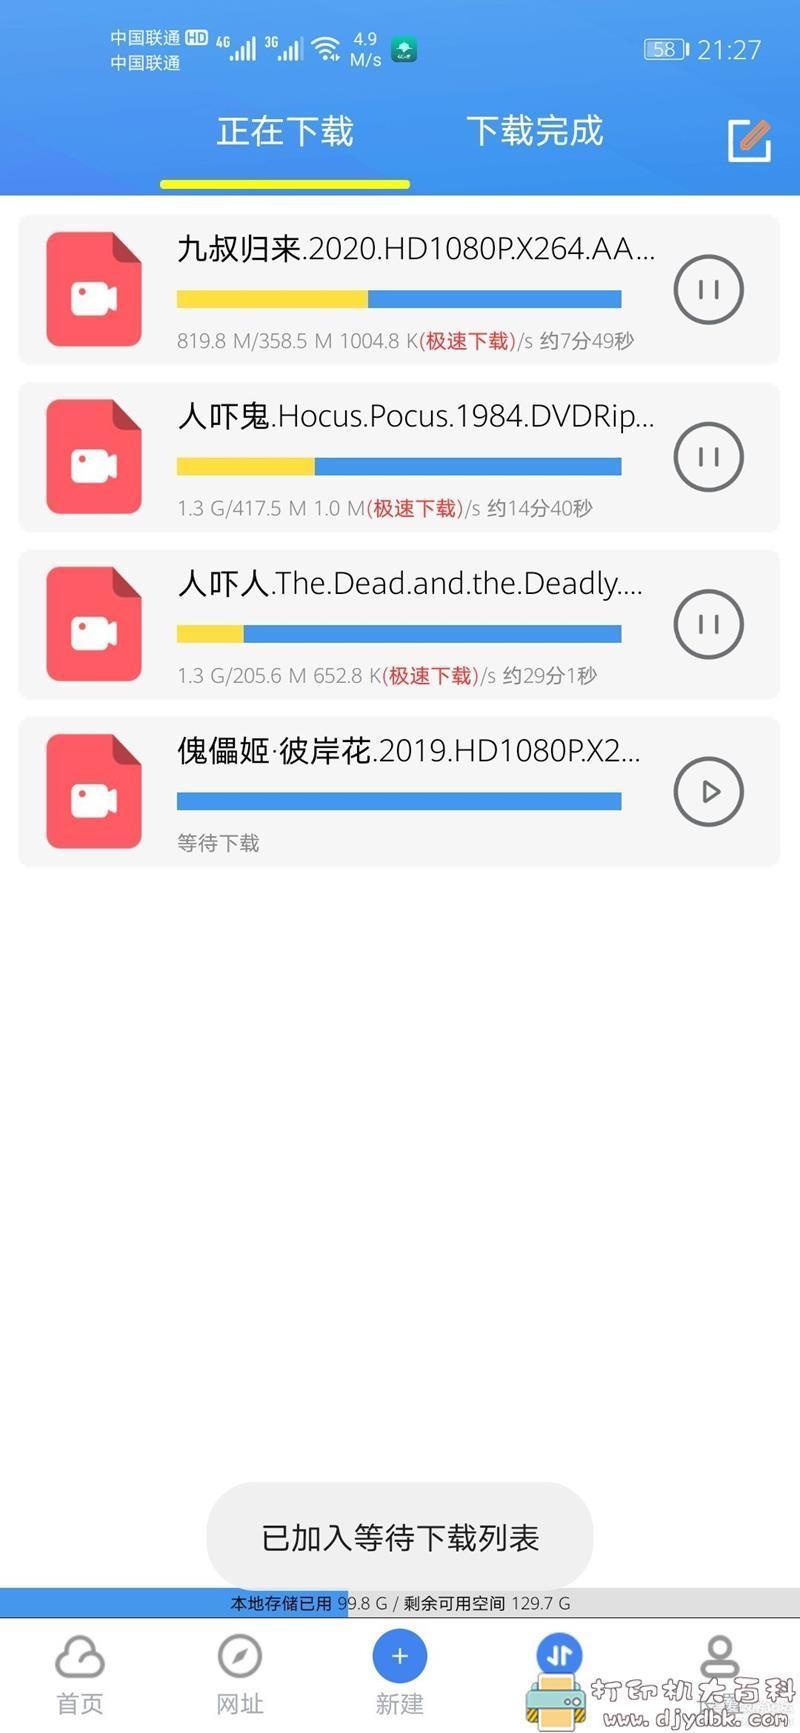 [Android]资源搜索及下载神器,资源鲨V3.5.0图片 No.2